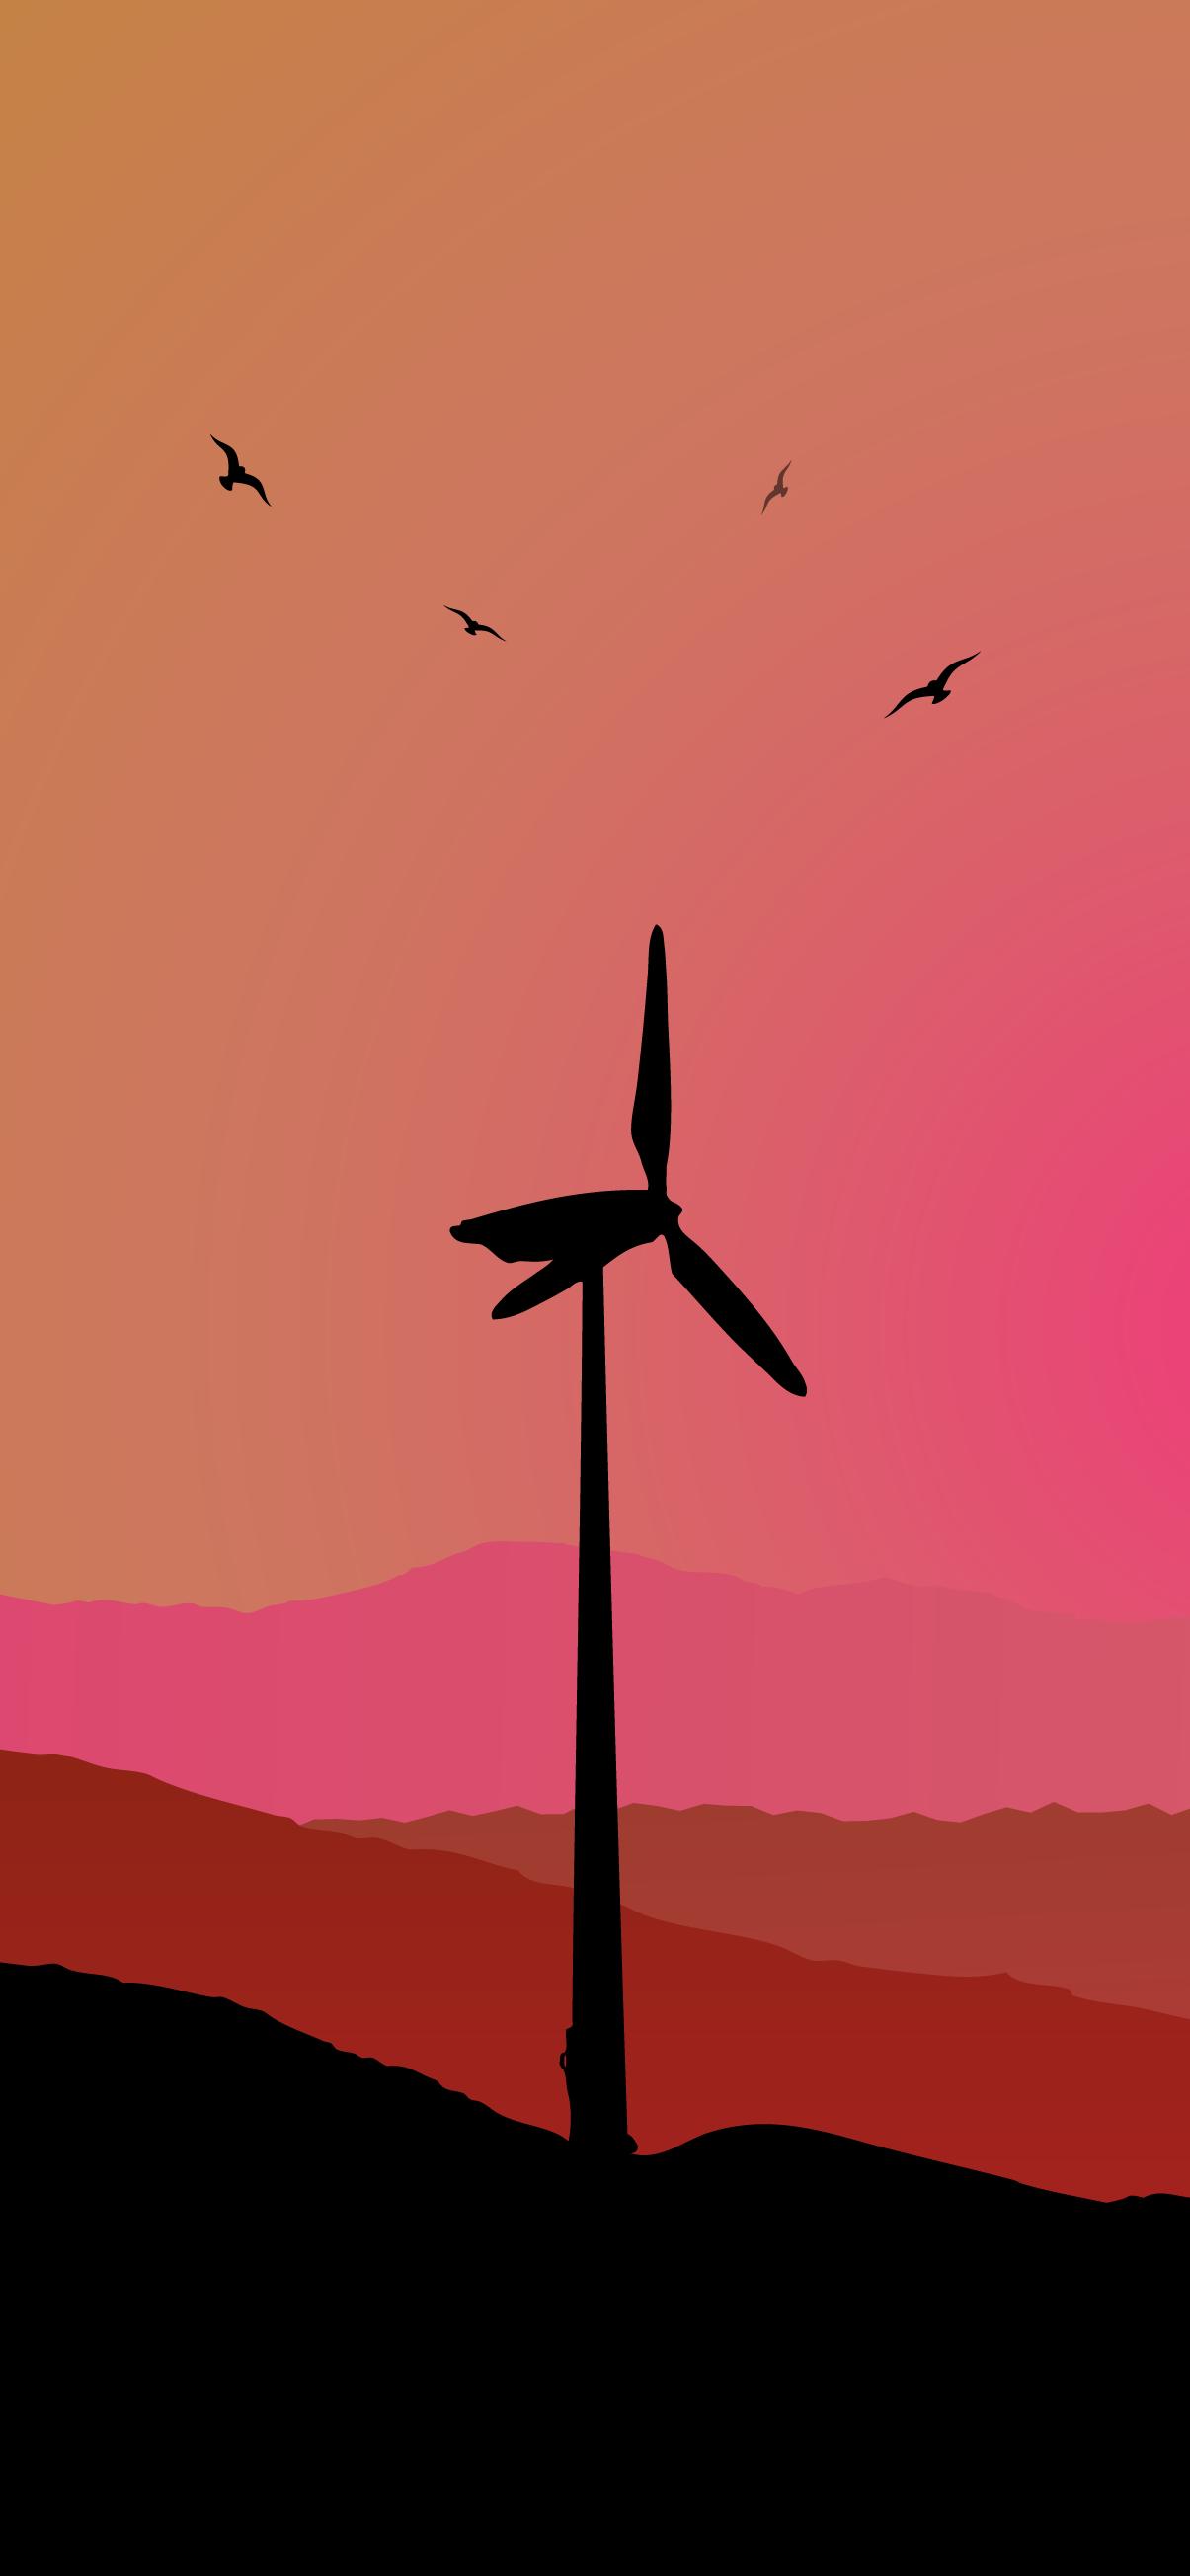 turbine wind phone wallpaper 4k